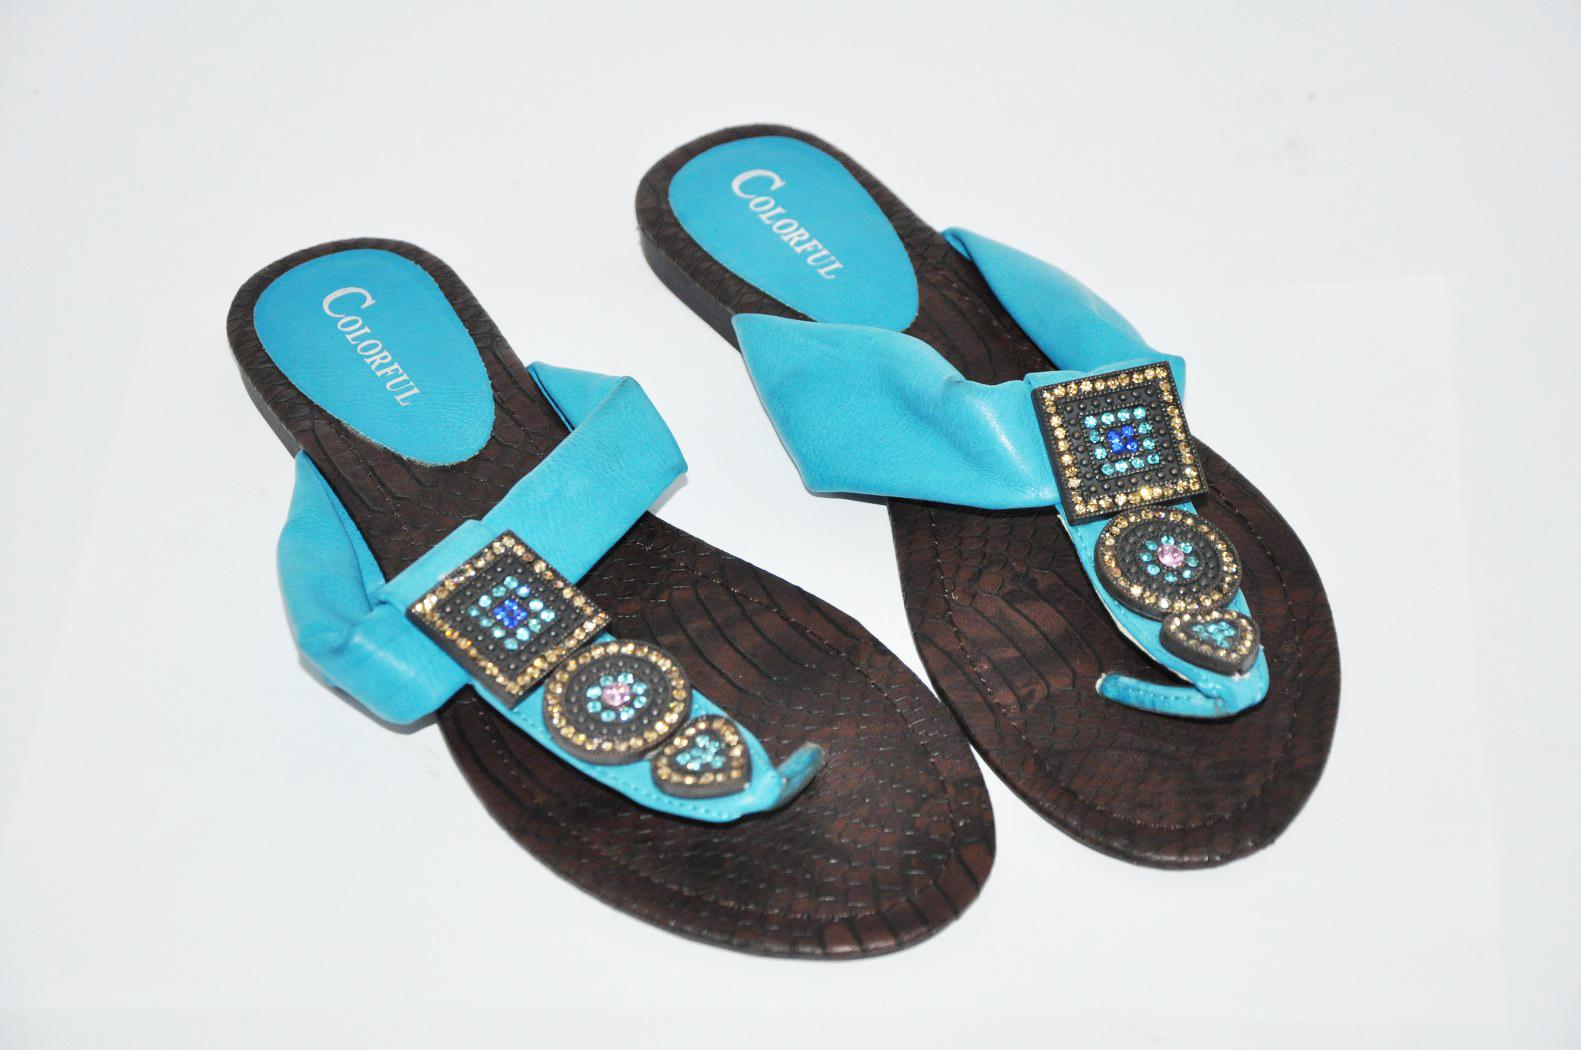 4e419a18e57fc japonki sandały buty 38 - 7351064441 - oficjalne archiwum allegro